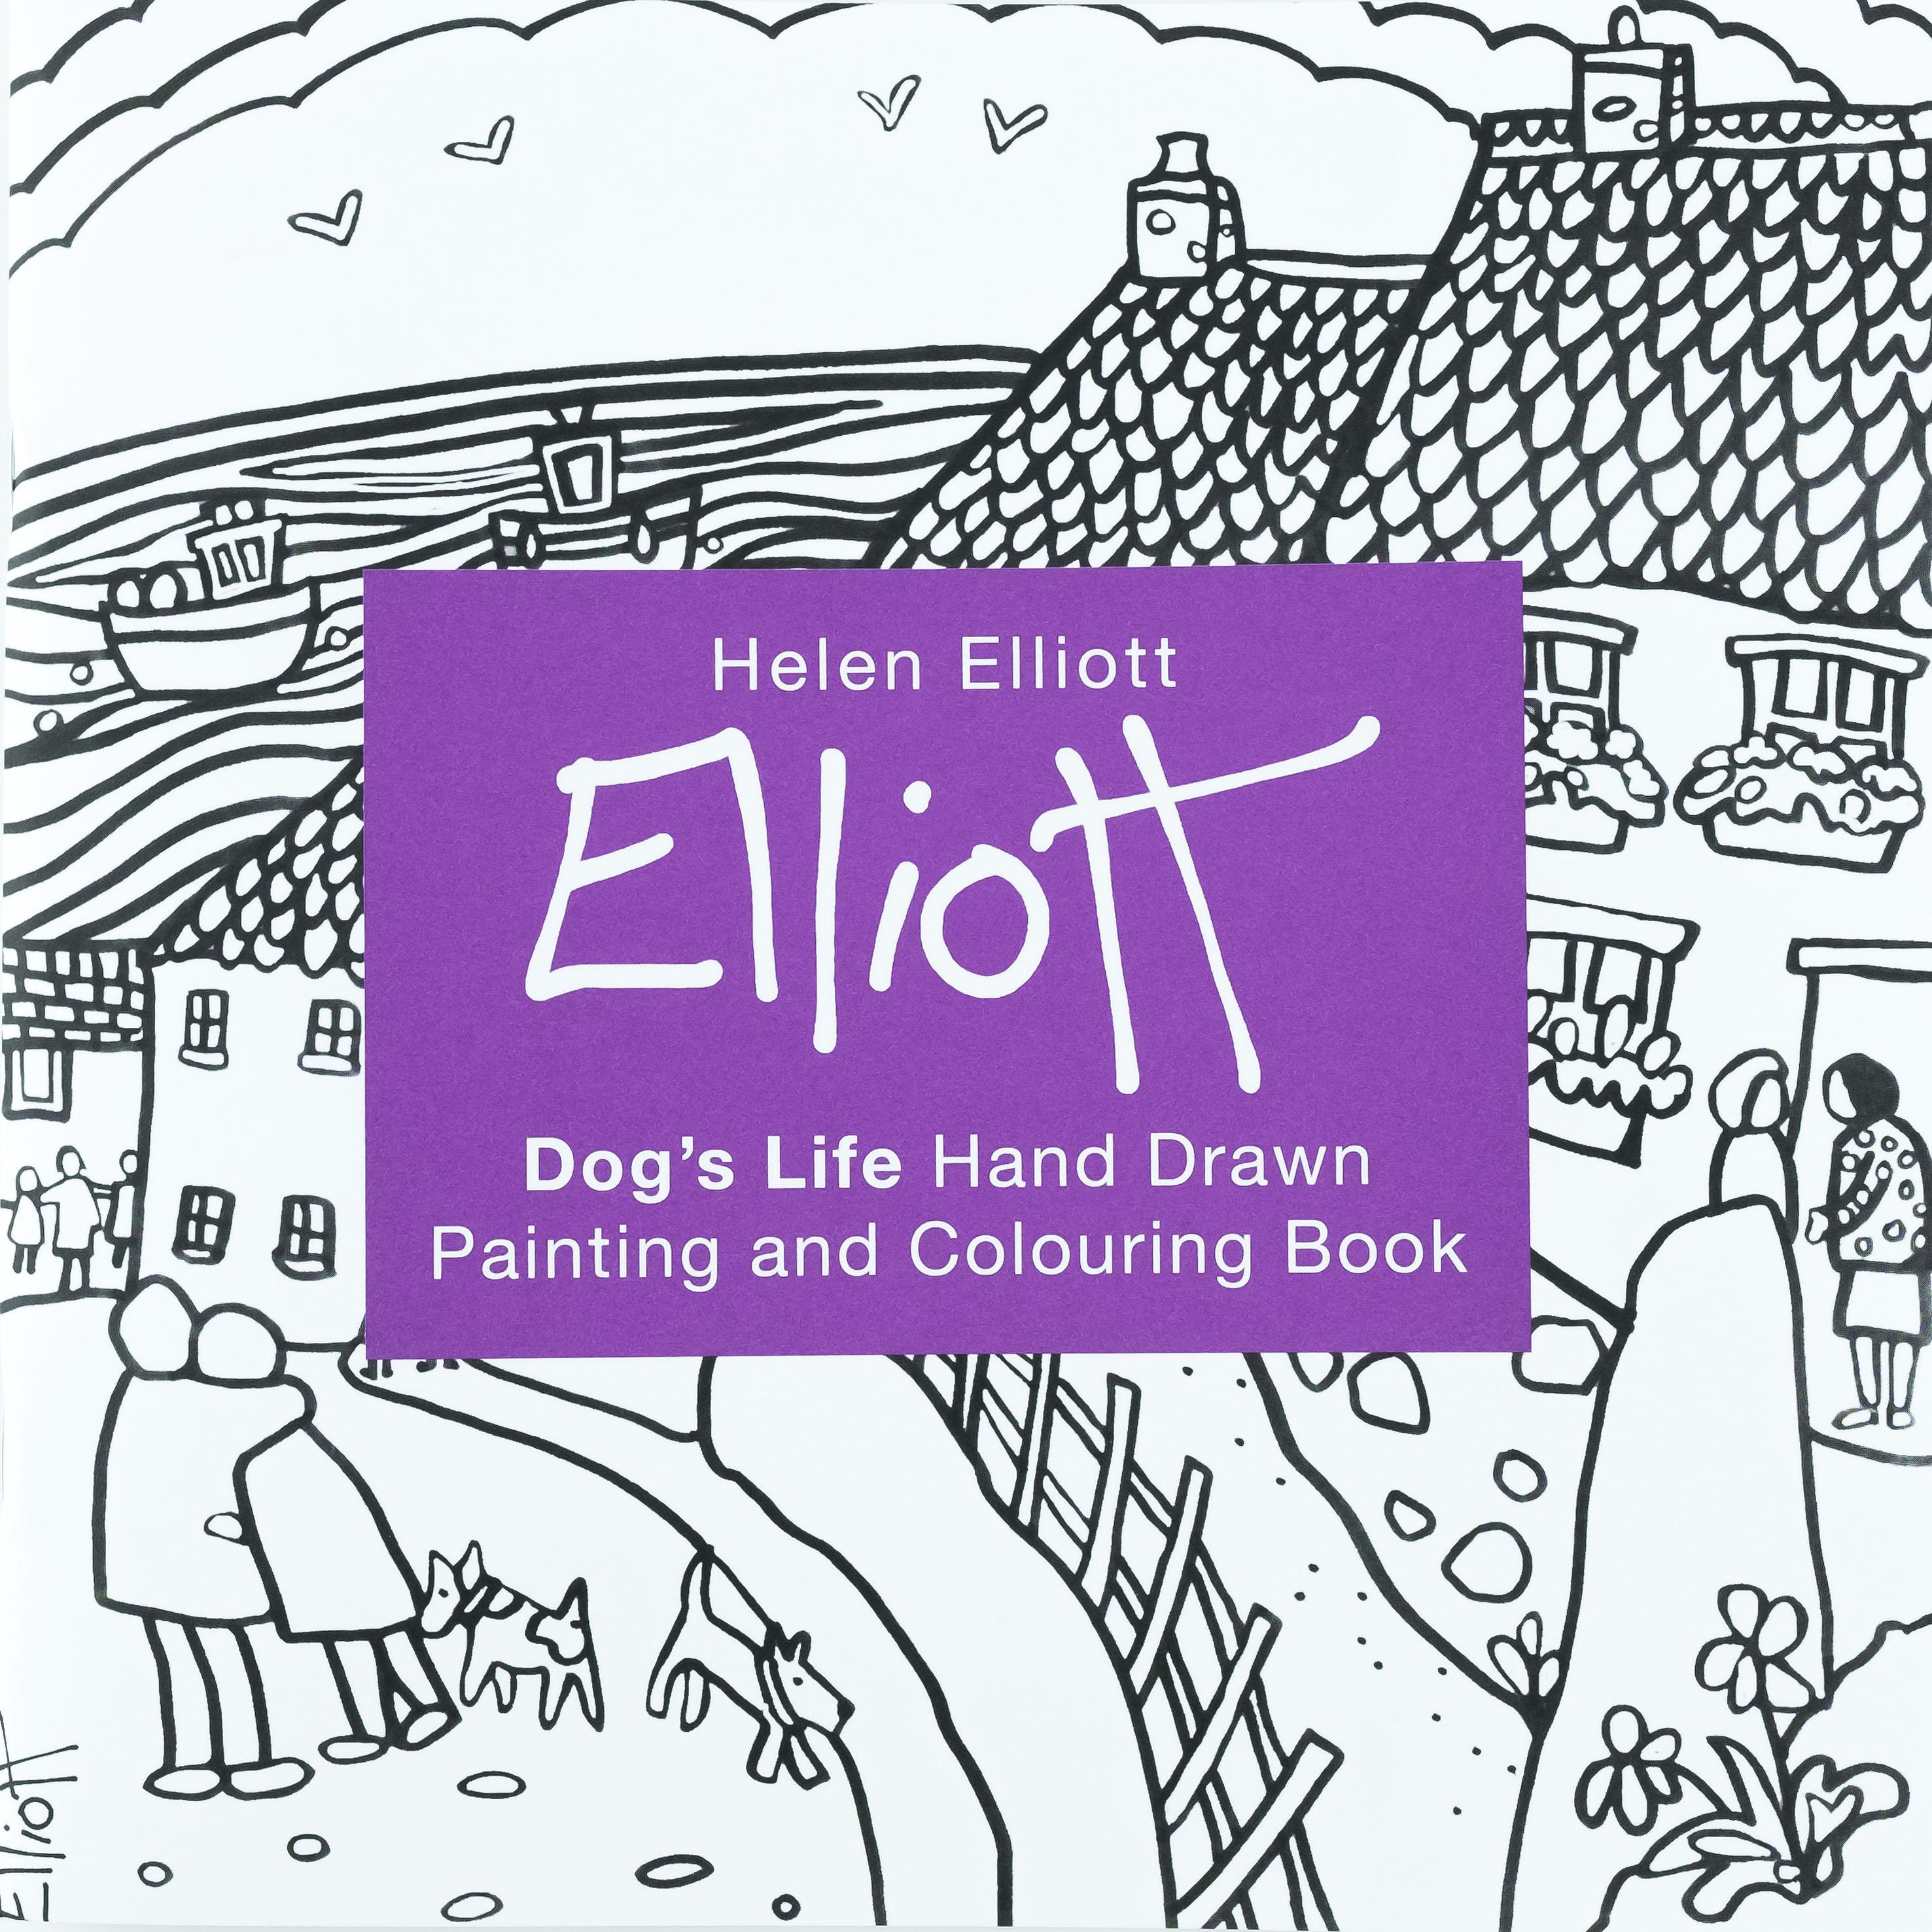 Helen Elliott Art   West Wales   Prints & Gallery   Colouring Book